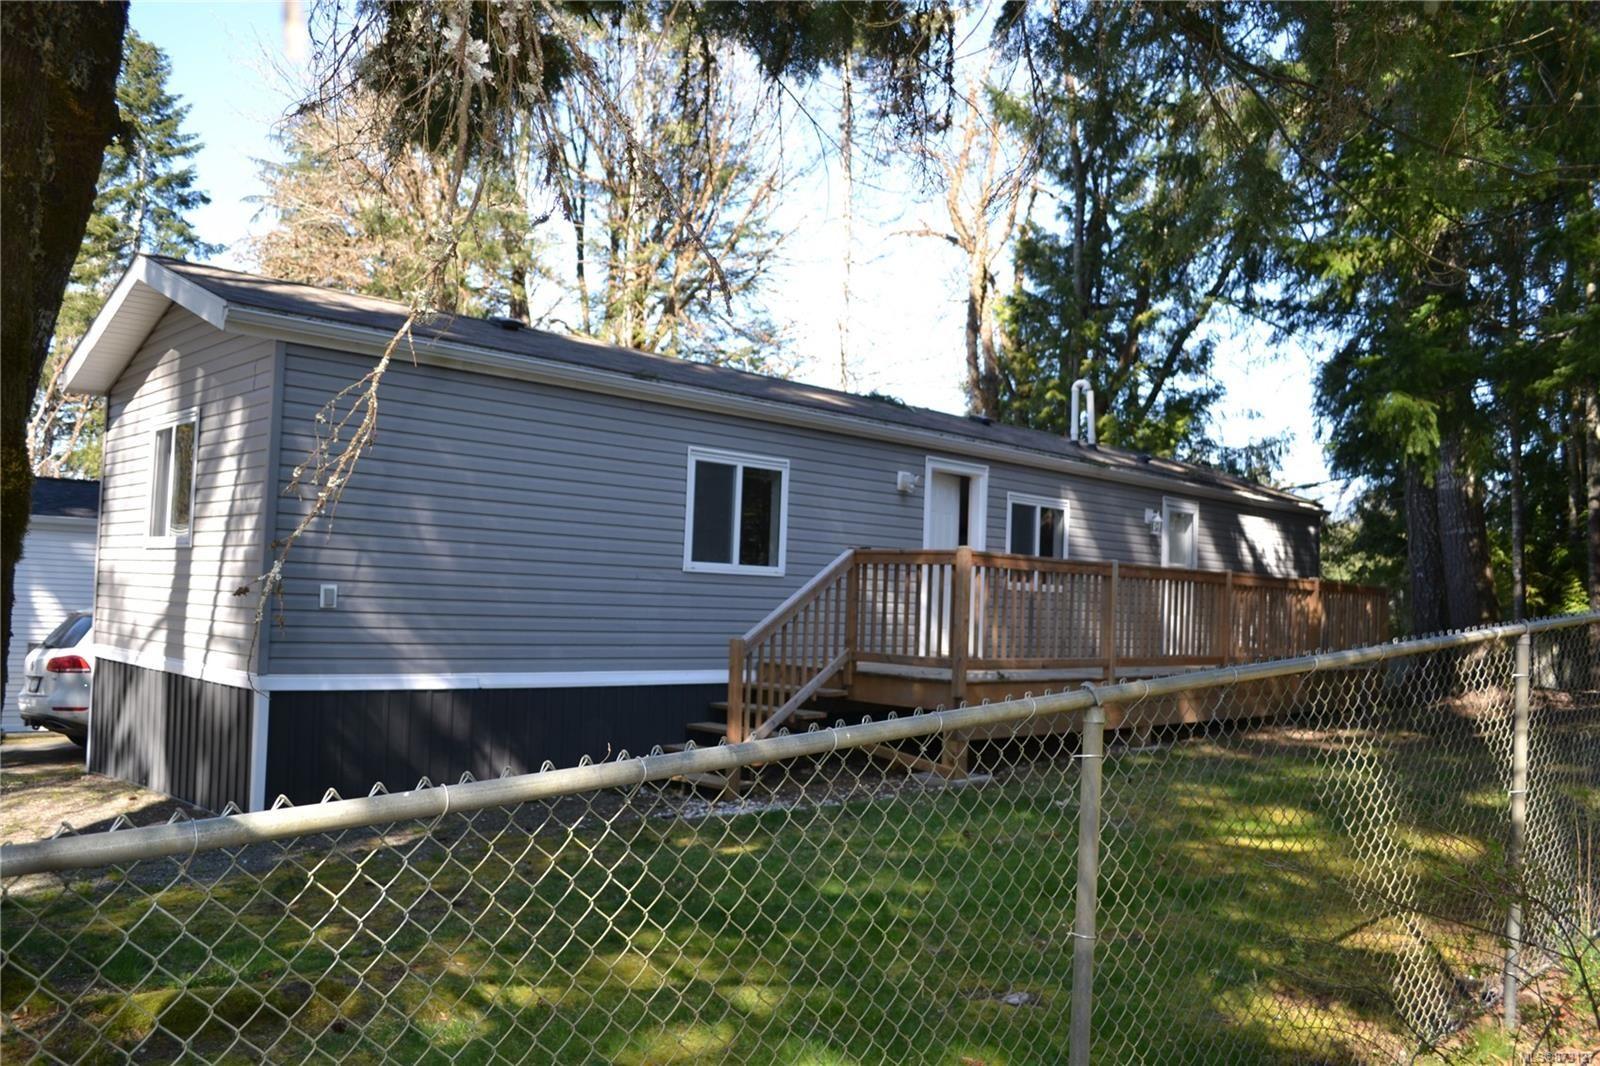 Main Photo: 9 3258 ALBERNI Hwy in : PA Alberni Valley Manufactured Home for sale (Port Alberni)  : MLS®# 873127